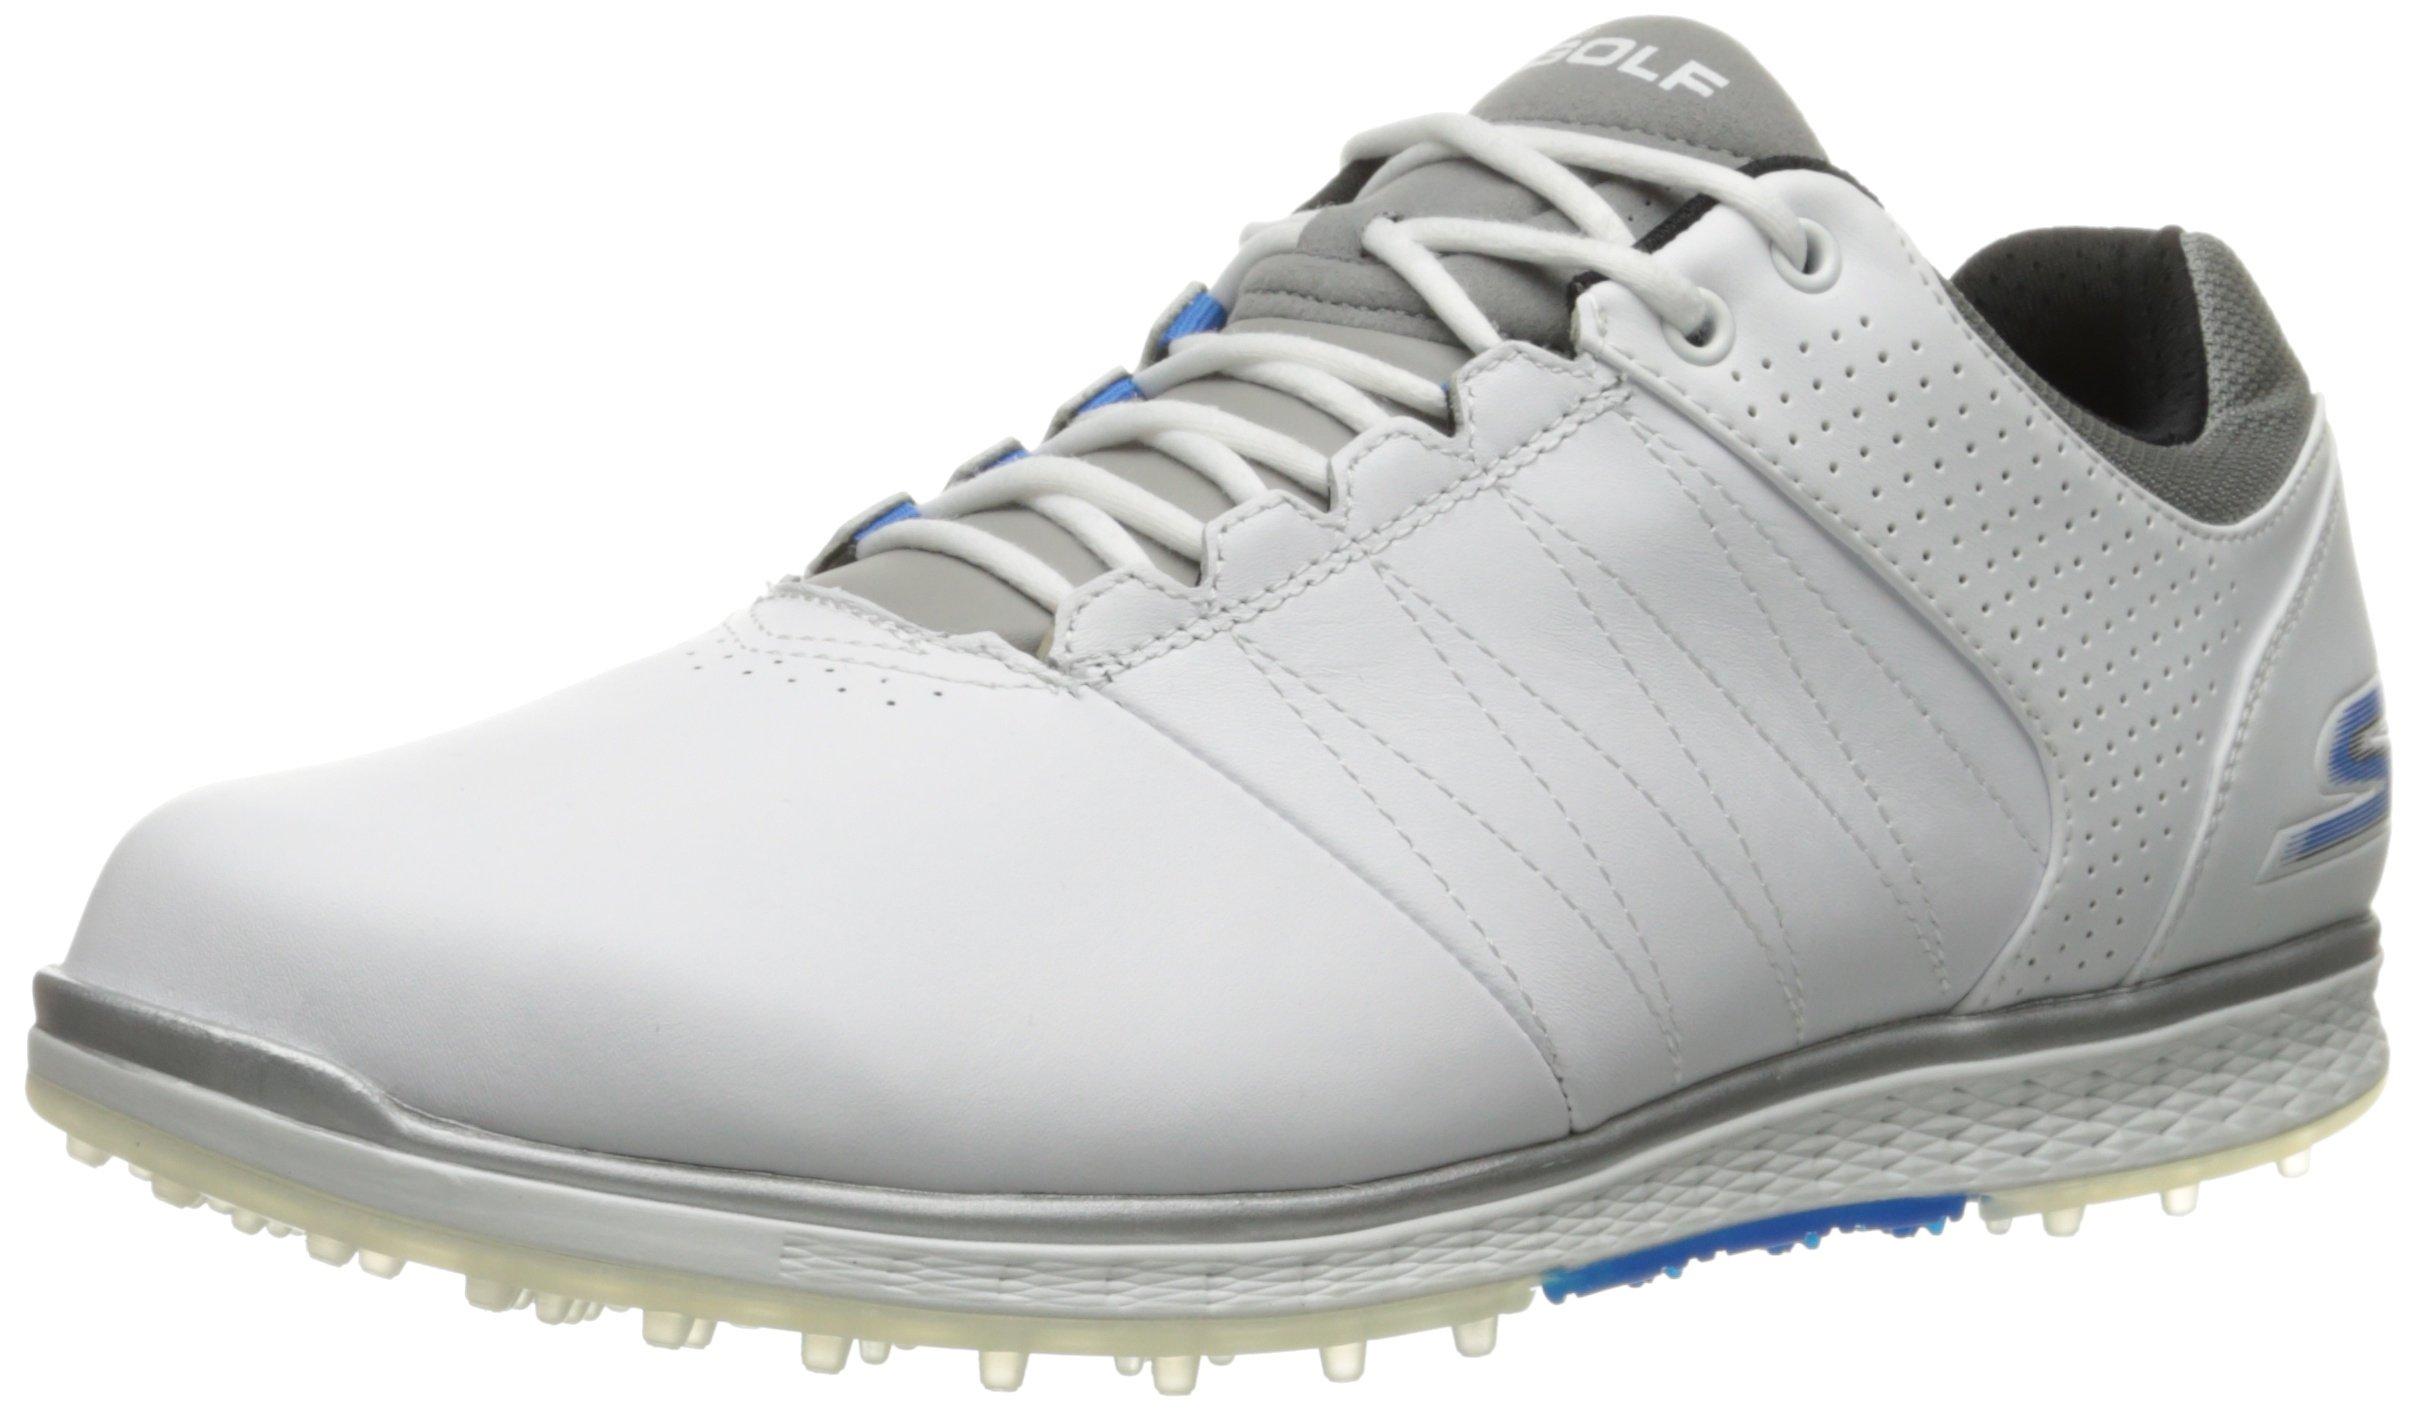 Skechers Performance Men's Go Golf Elite 2 Wide Golf Shoe,White/Gray/Blue,10 W US by Skechers